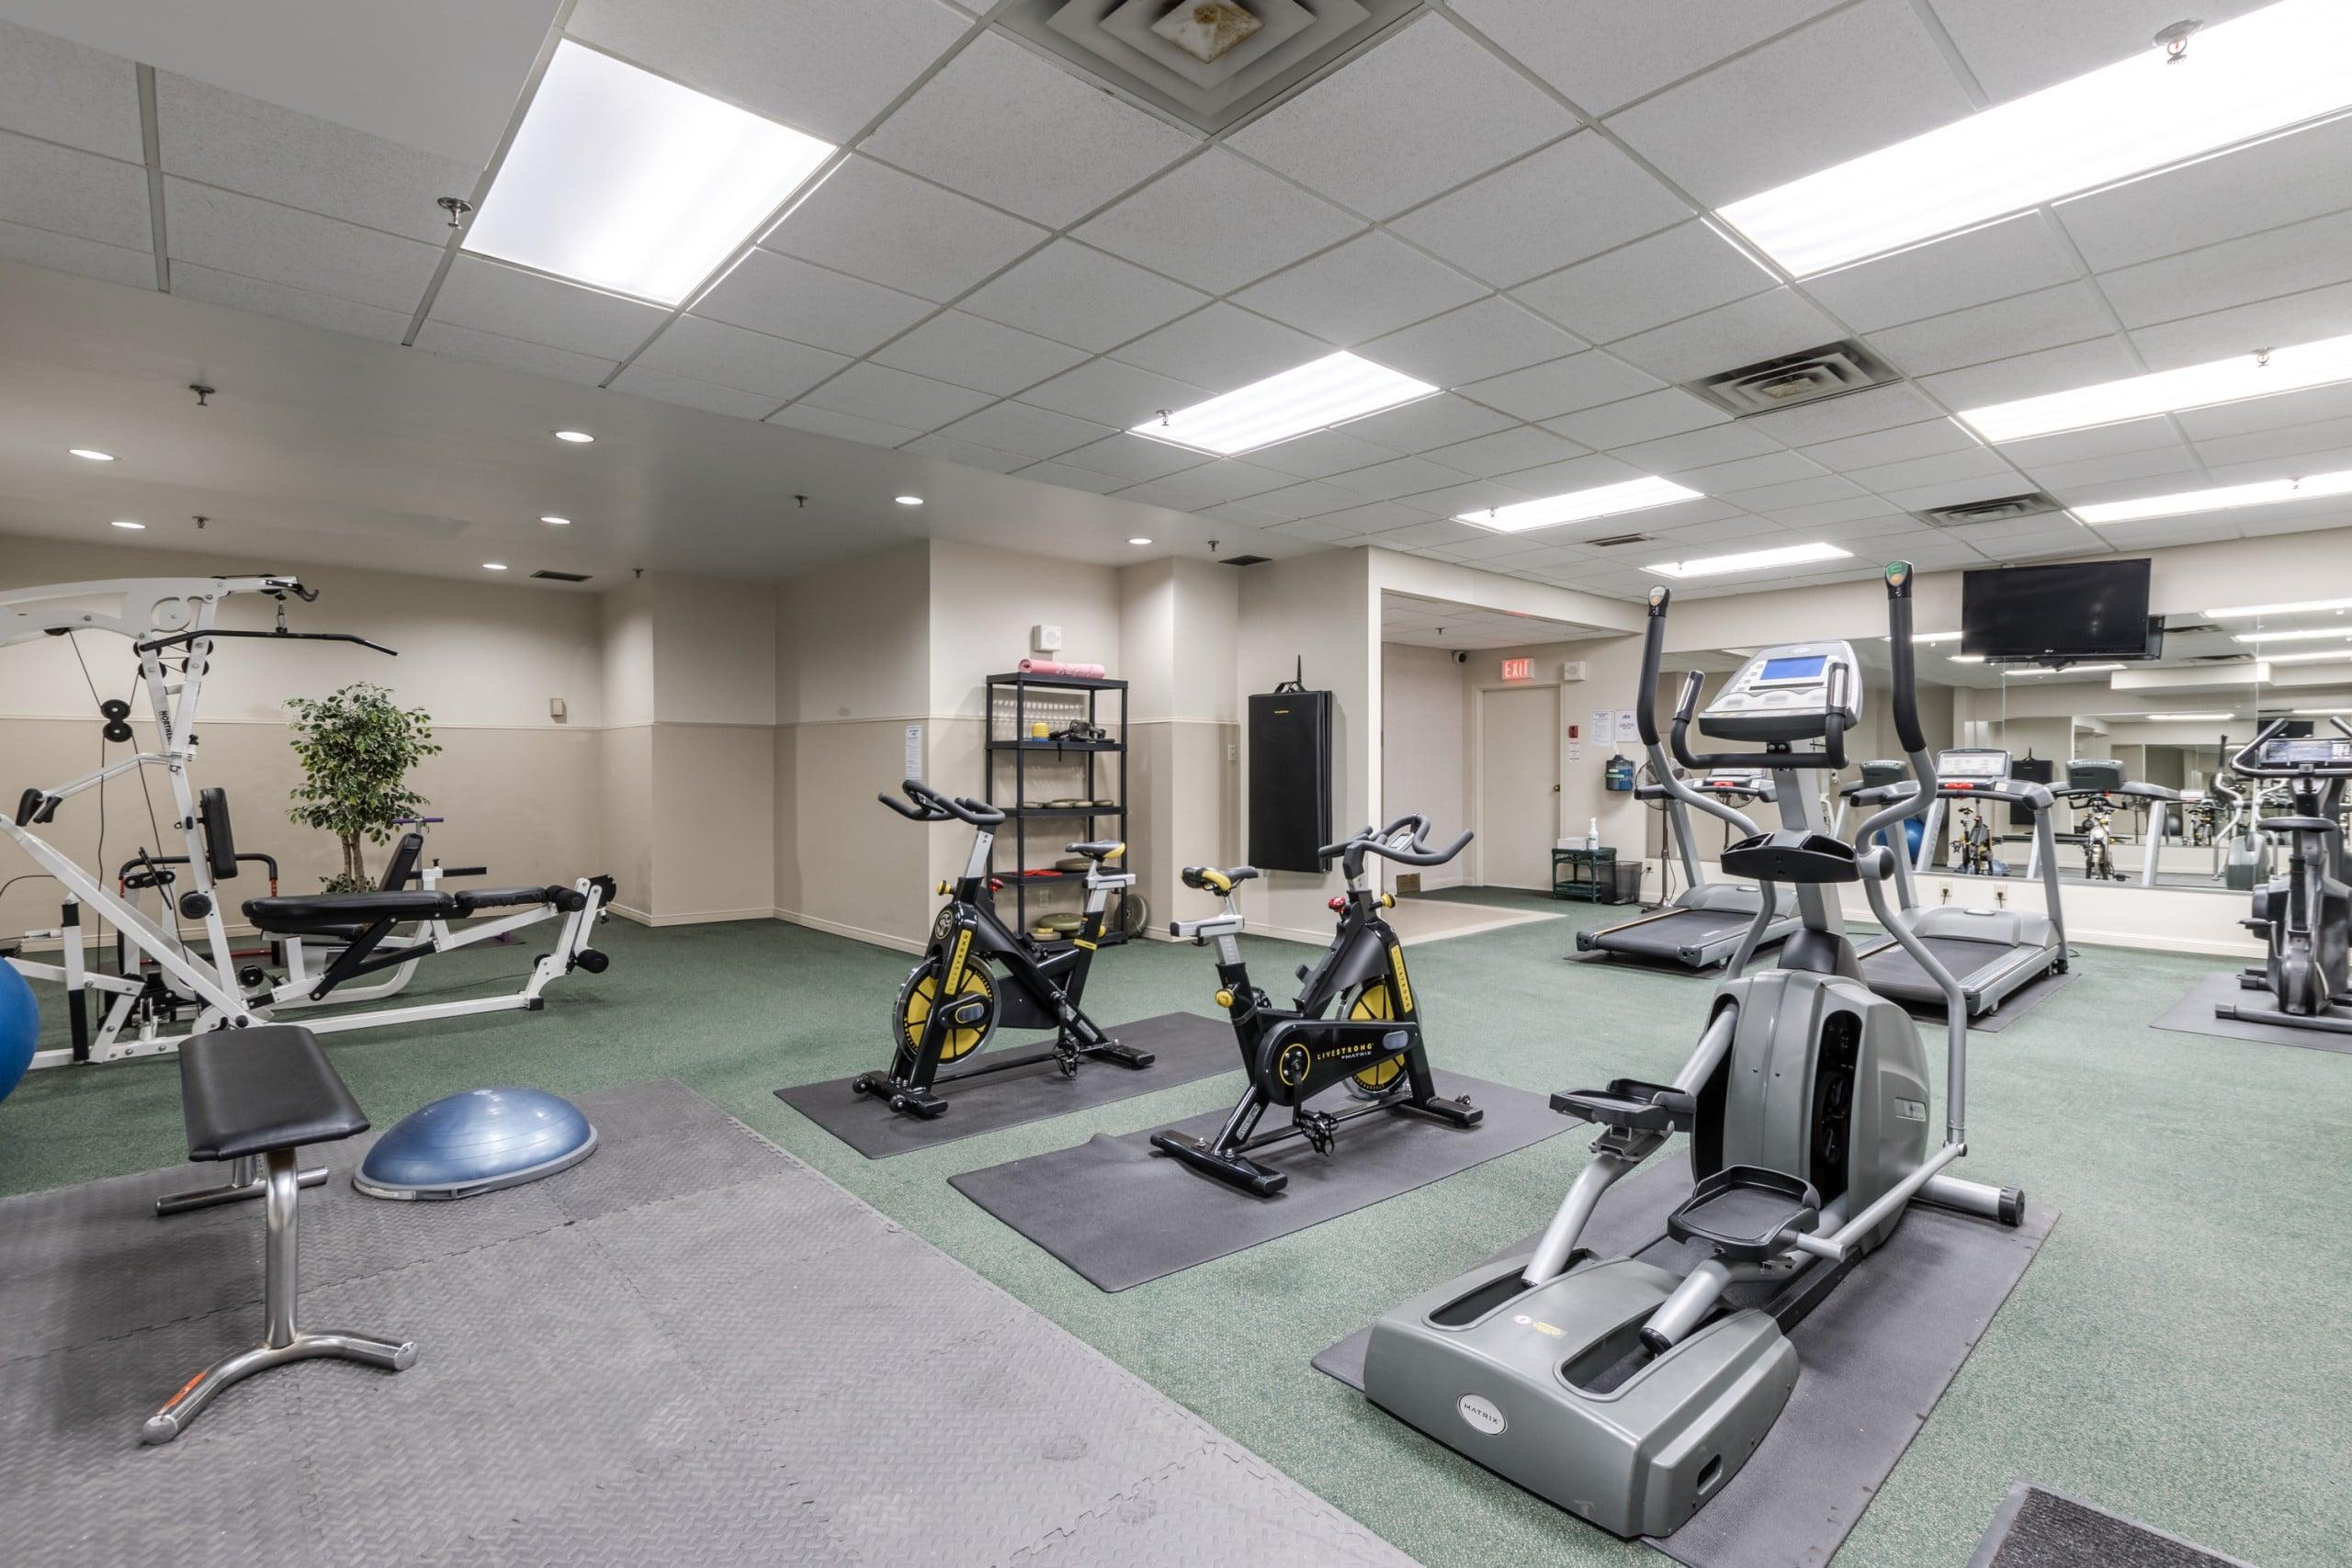 Gym featured at 508 – 415 Locust Street, Burlington, ON at Alex Irish & Associates